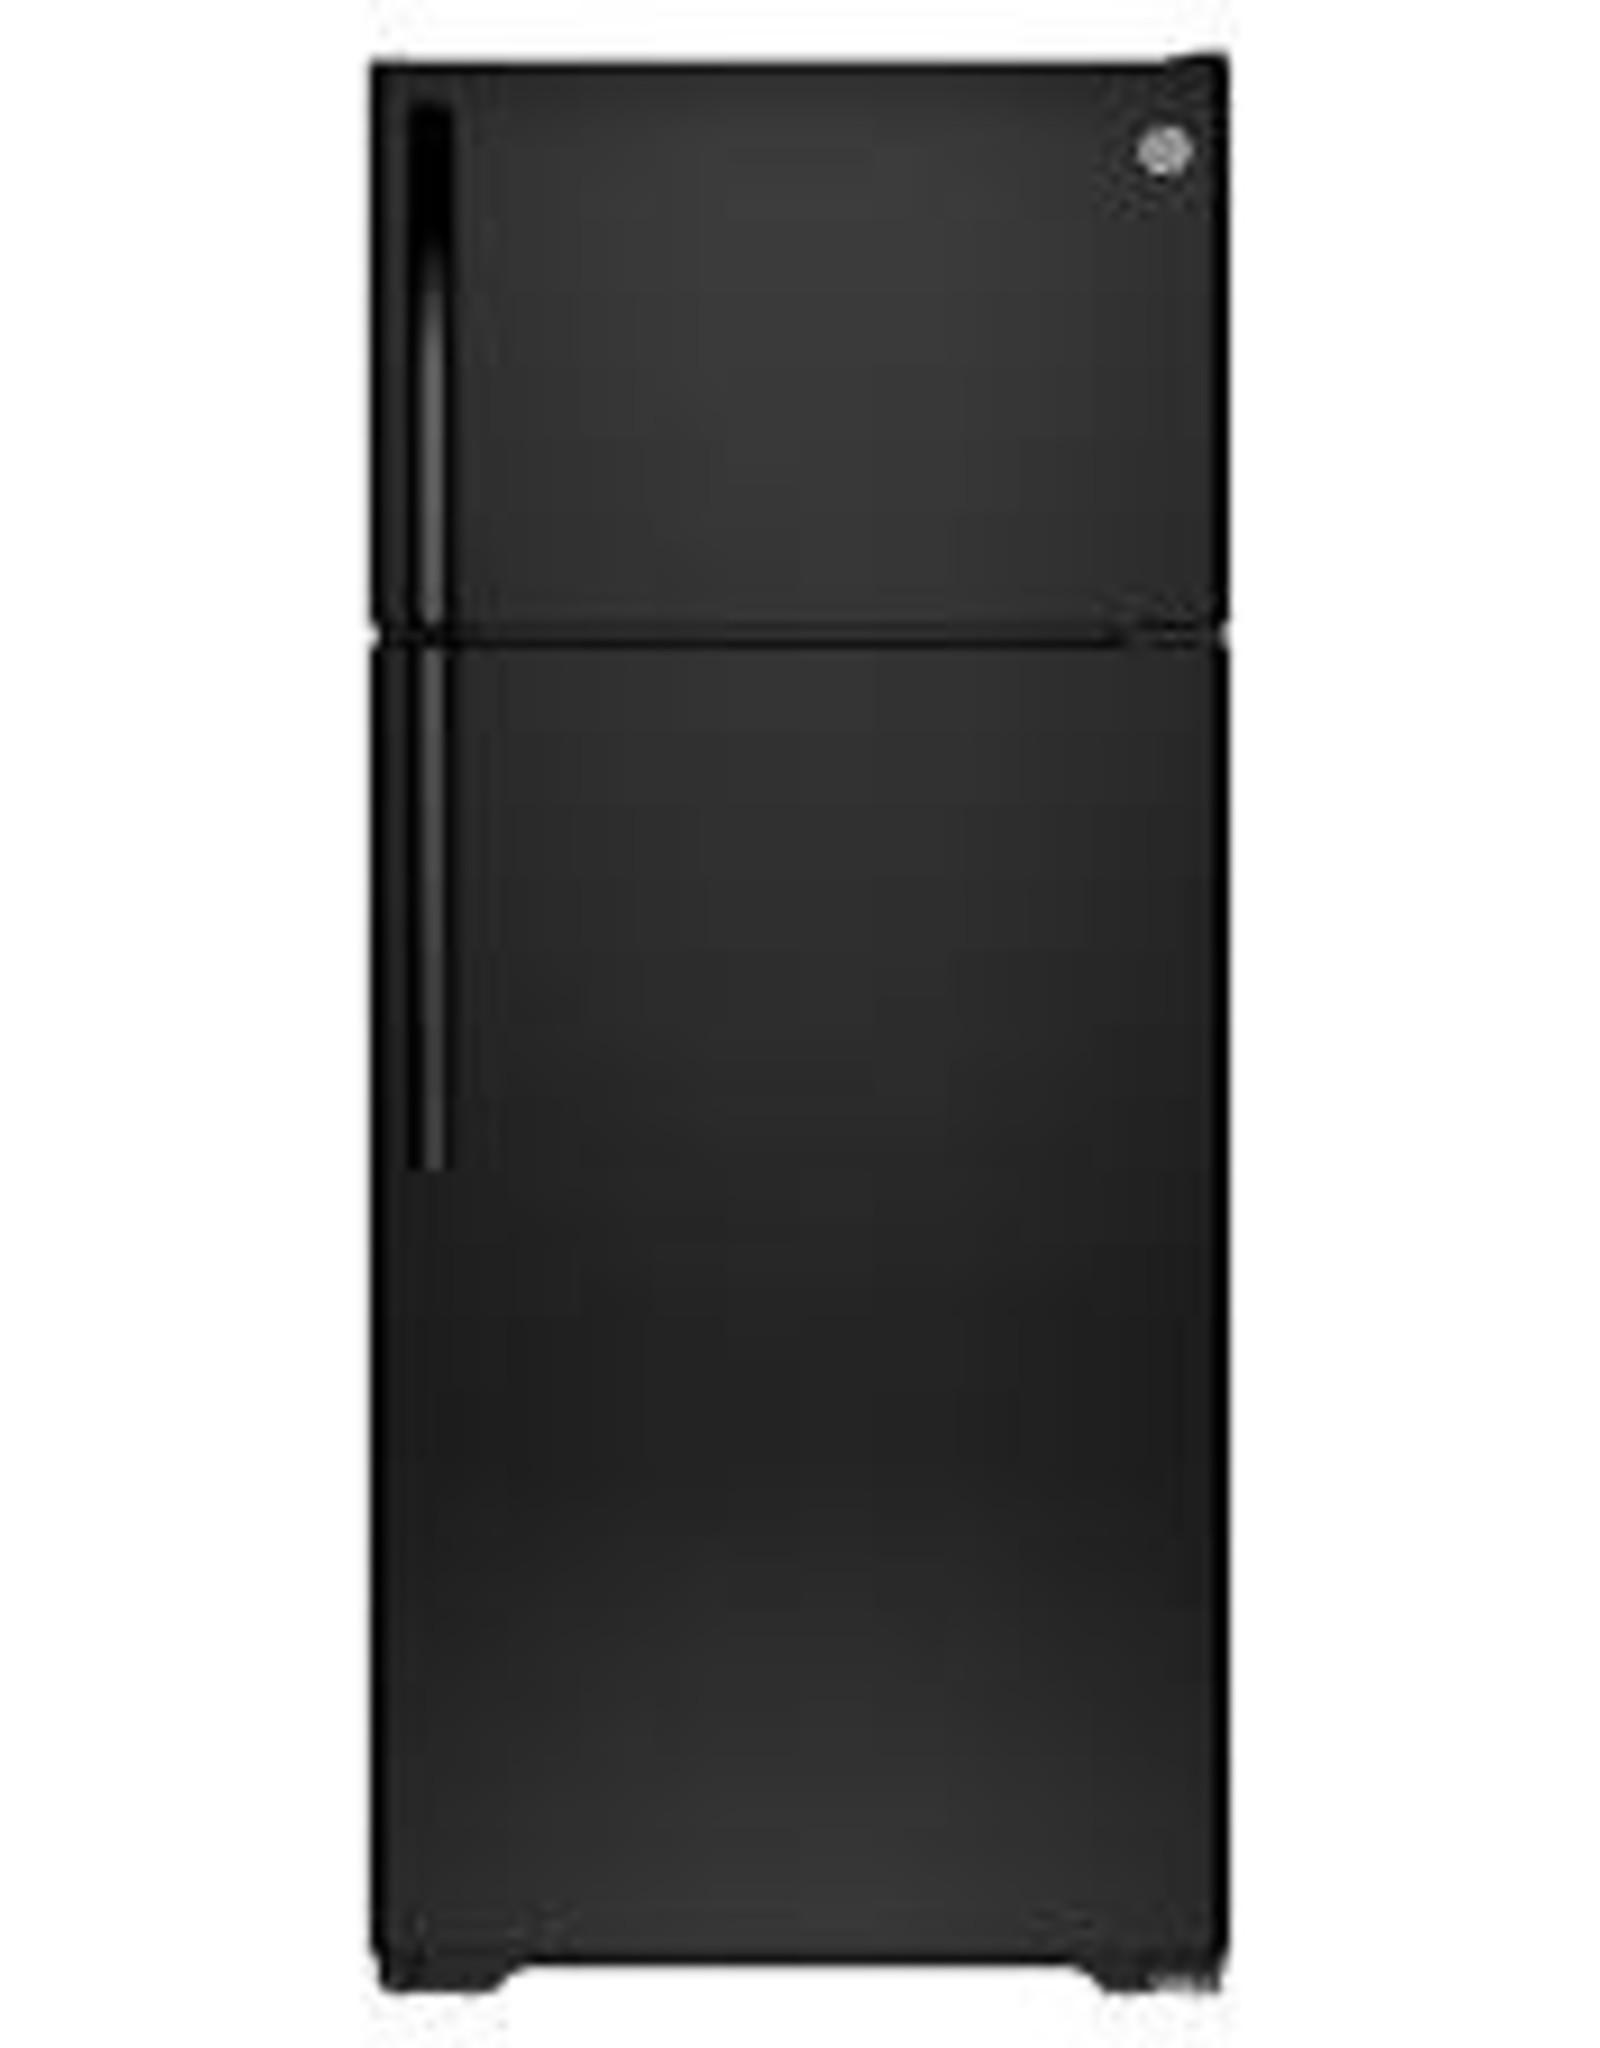 GE GE 21CFT Black Refrigerator